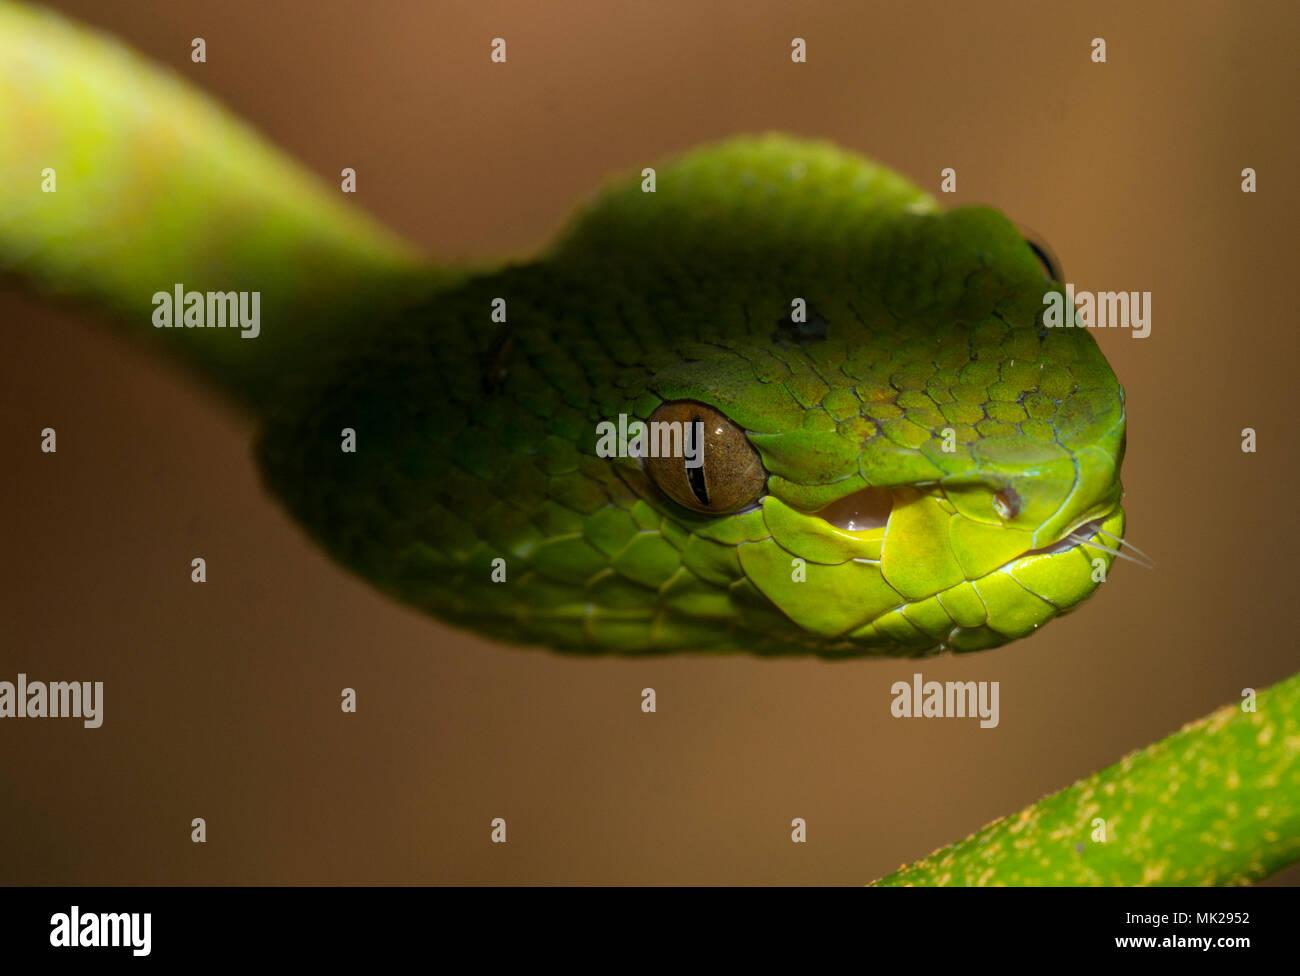 Hermosa hembra verde Phuket pit viper (Trimeresurus phuketensis) en un árbol de Phuket, Tailandia. Imagen De Stock